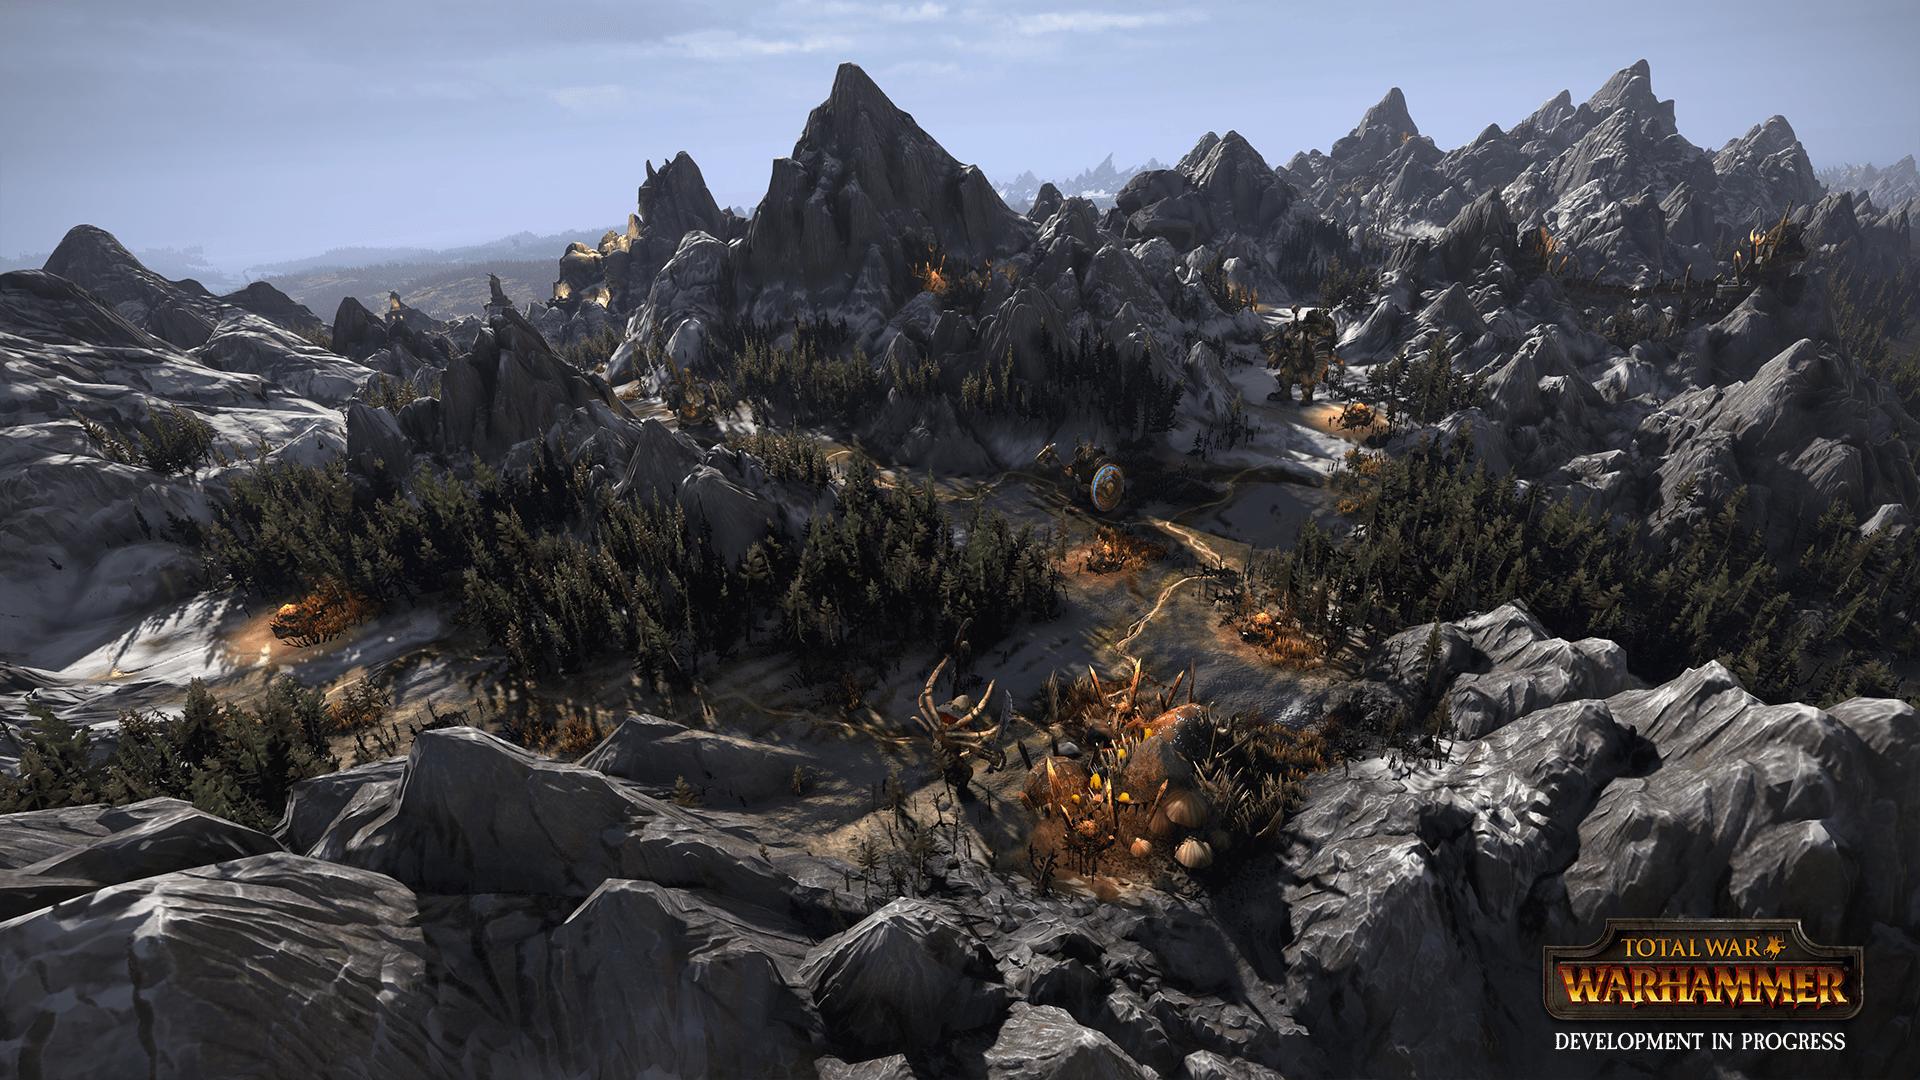 Total War: Warhammer Campaign Press Preview - Greenskins